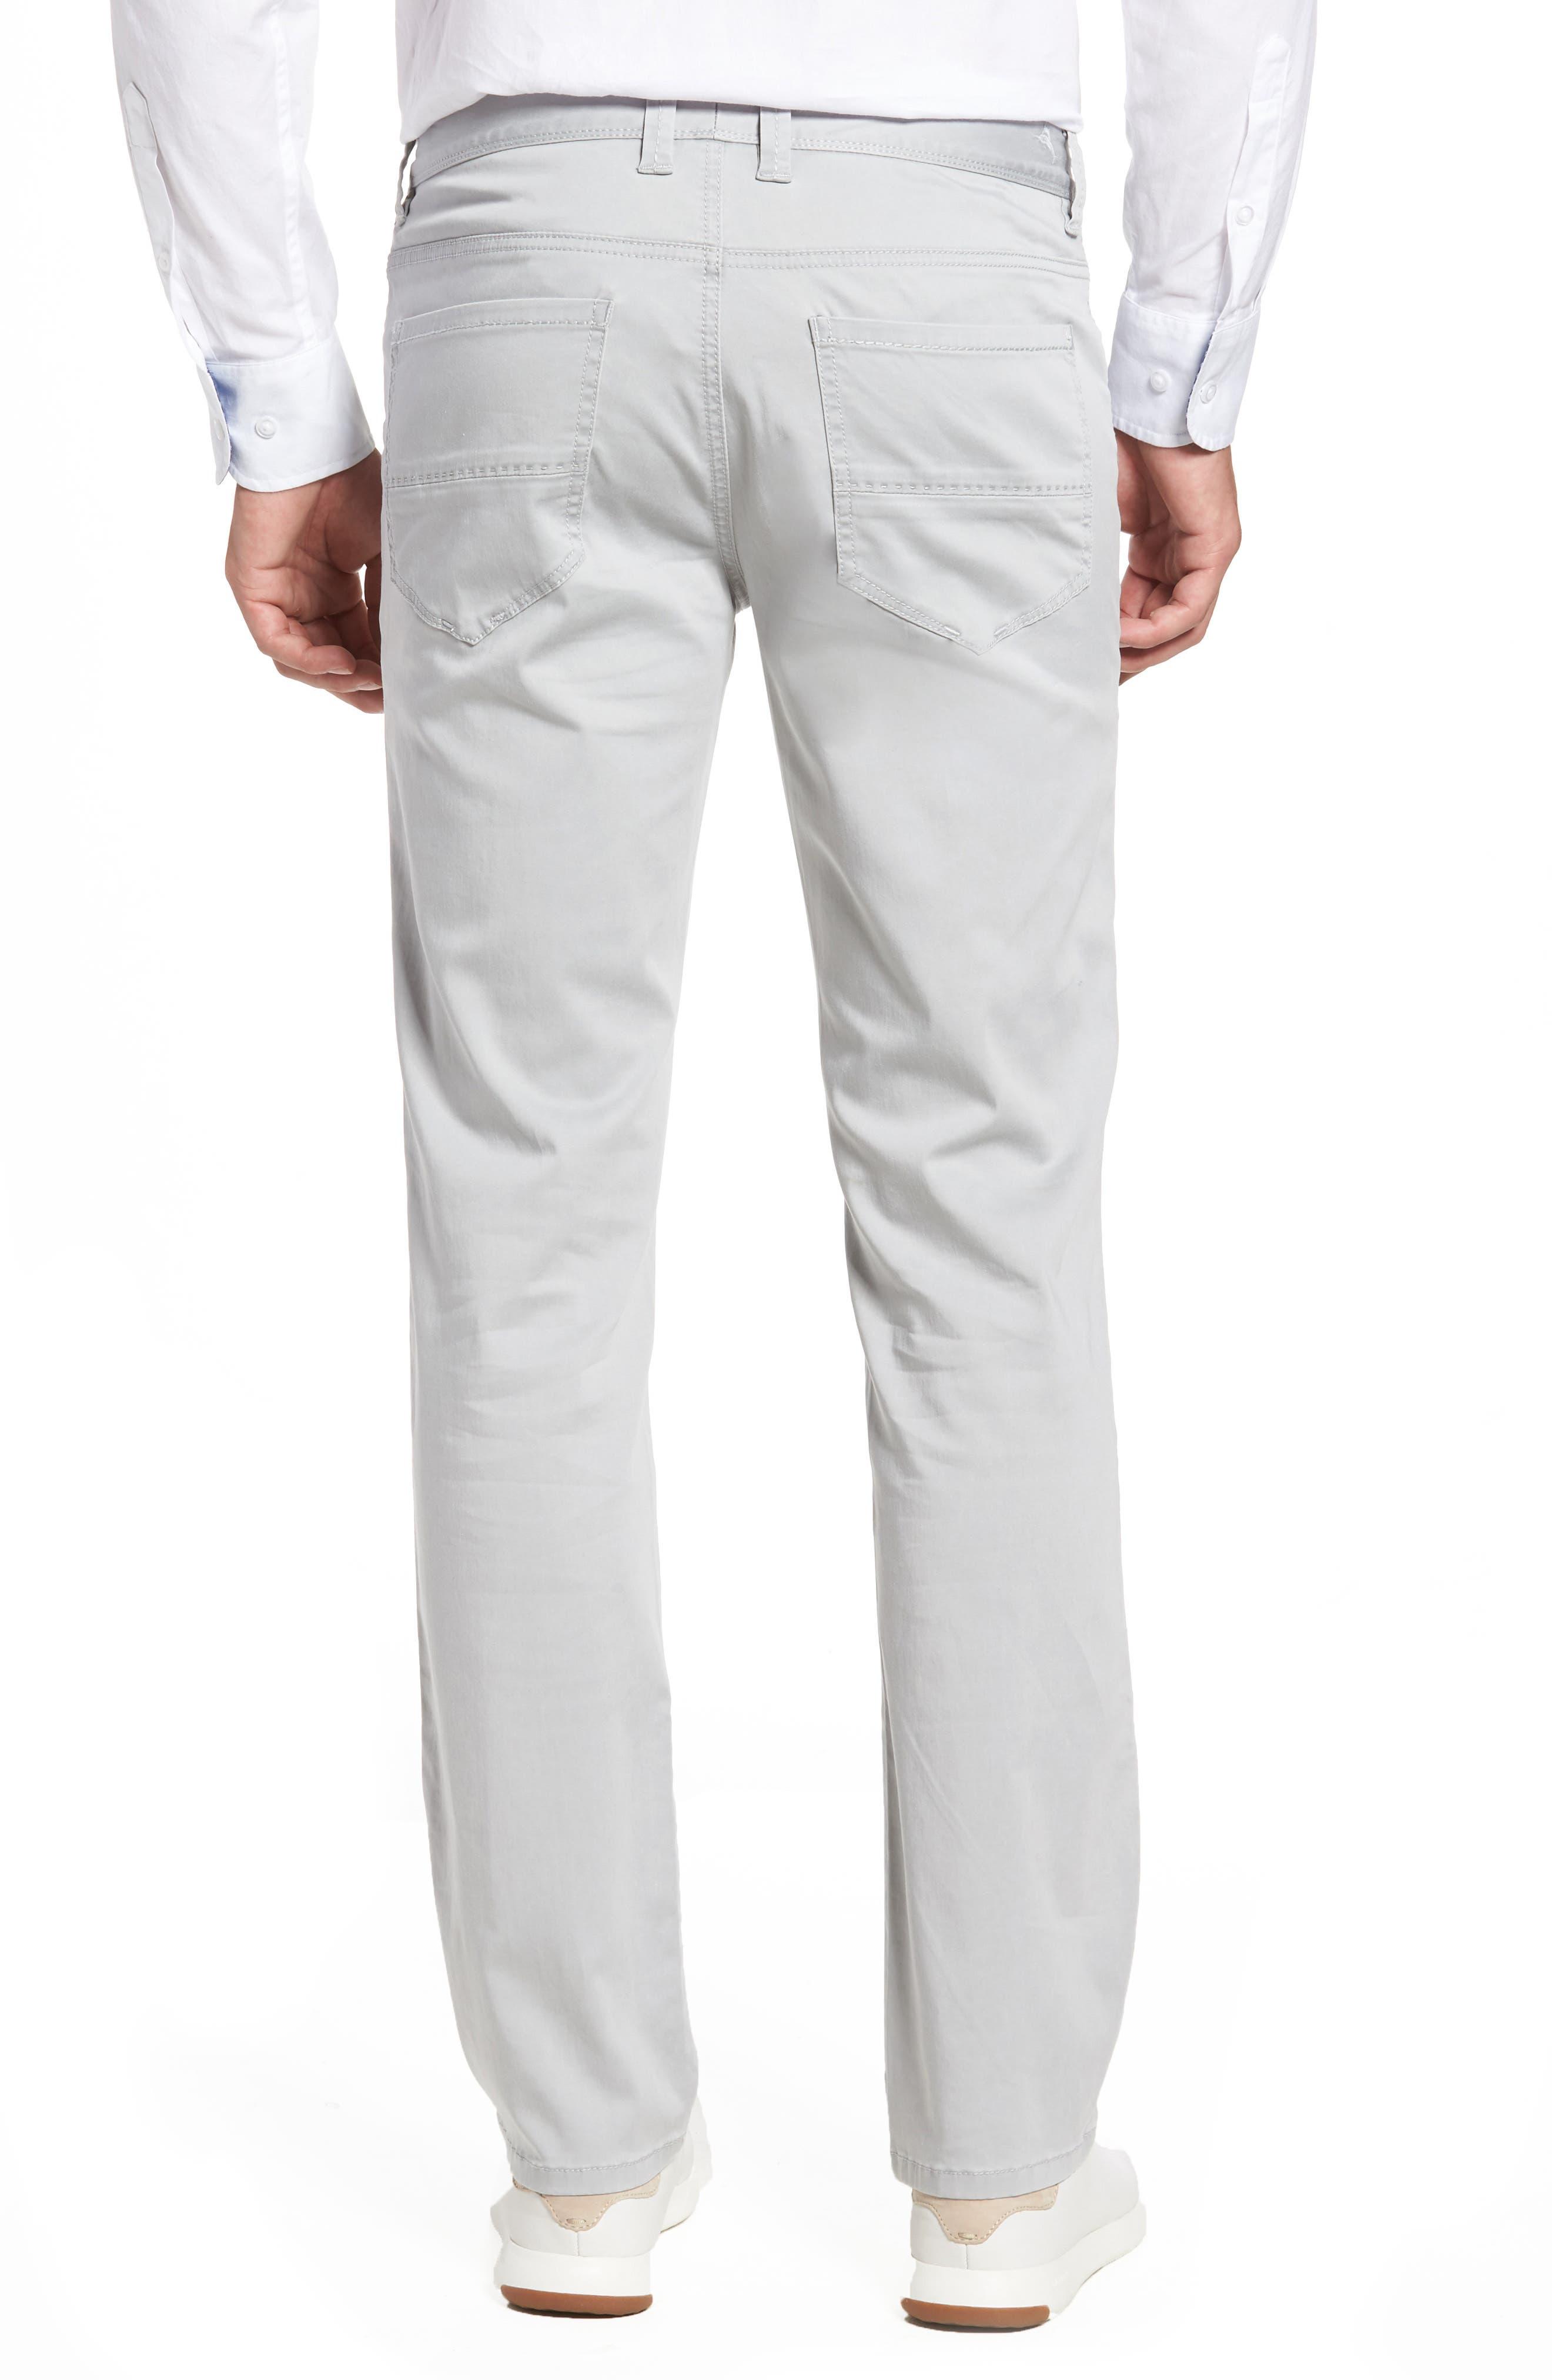 Boracay Pants,                             Alternate thumbnail 2, color,                             050